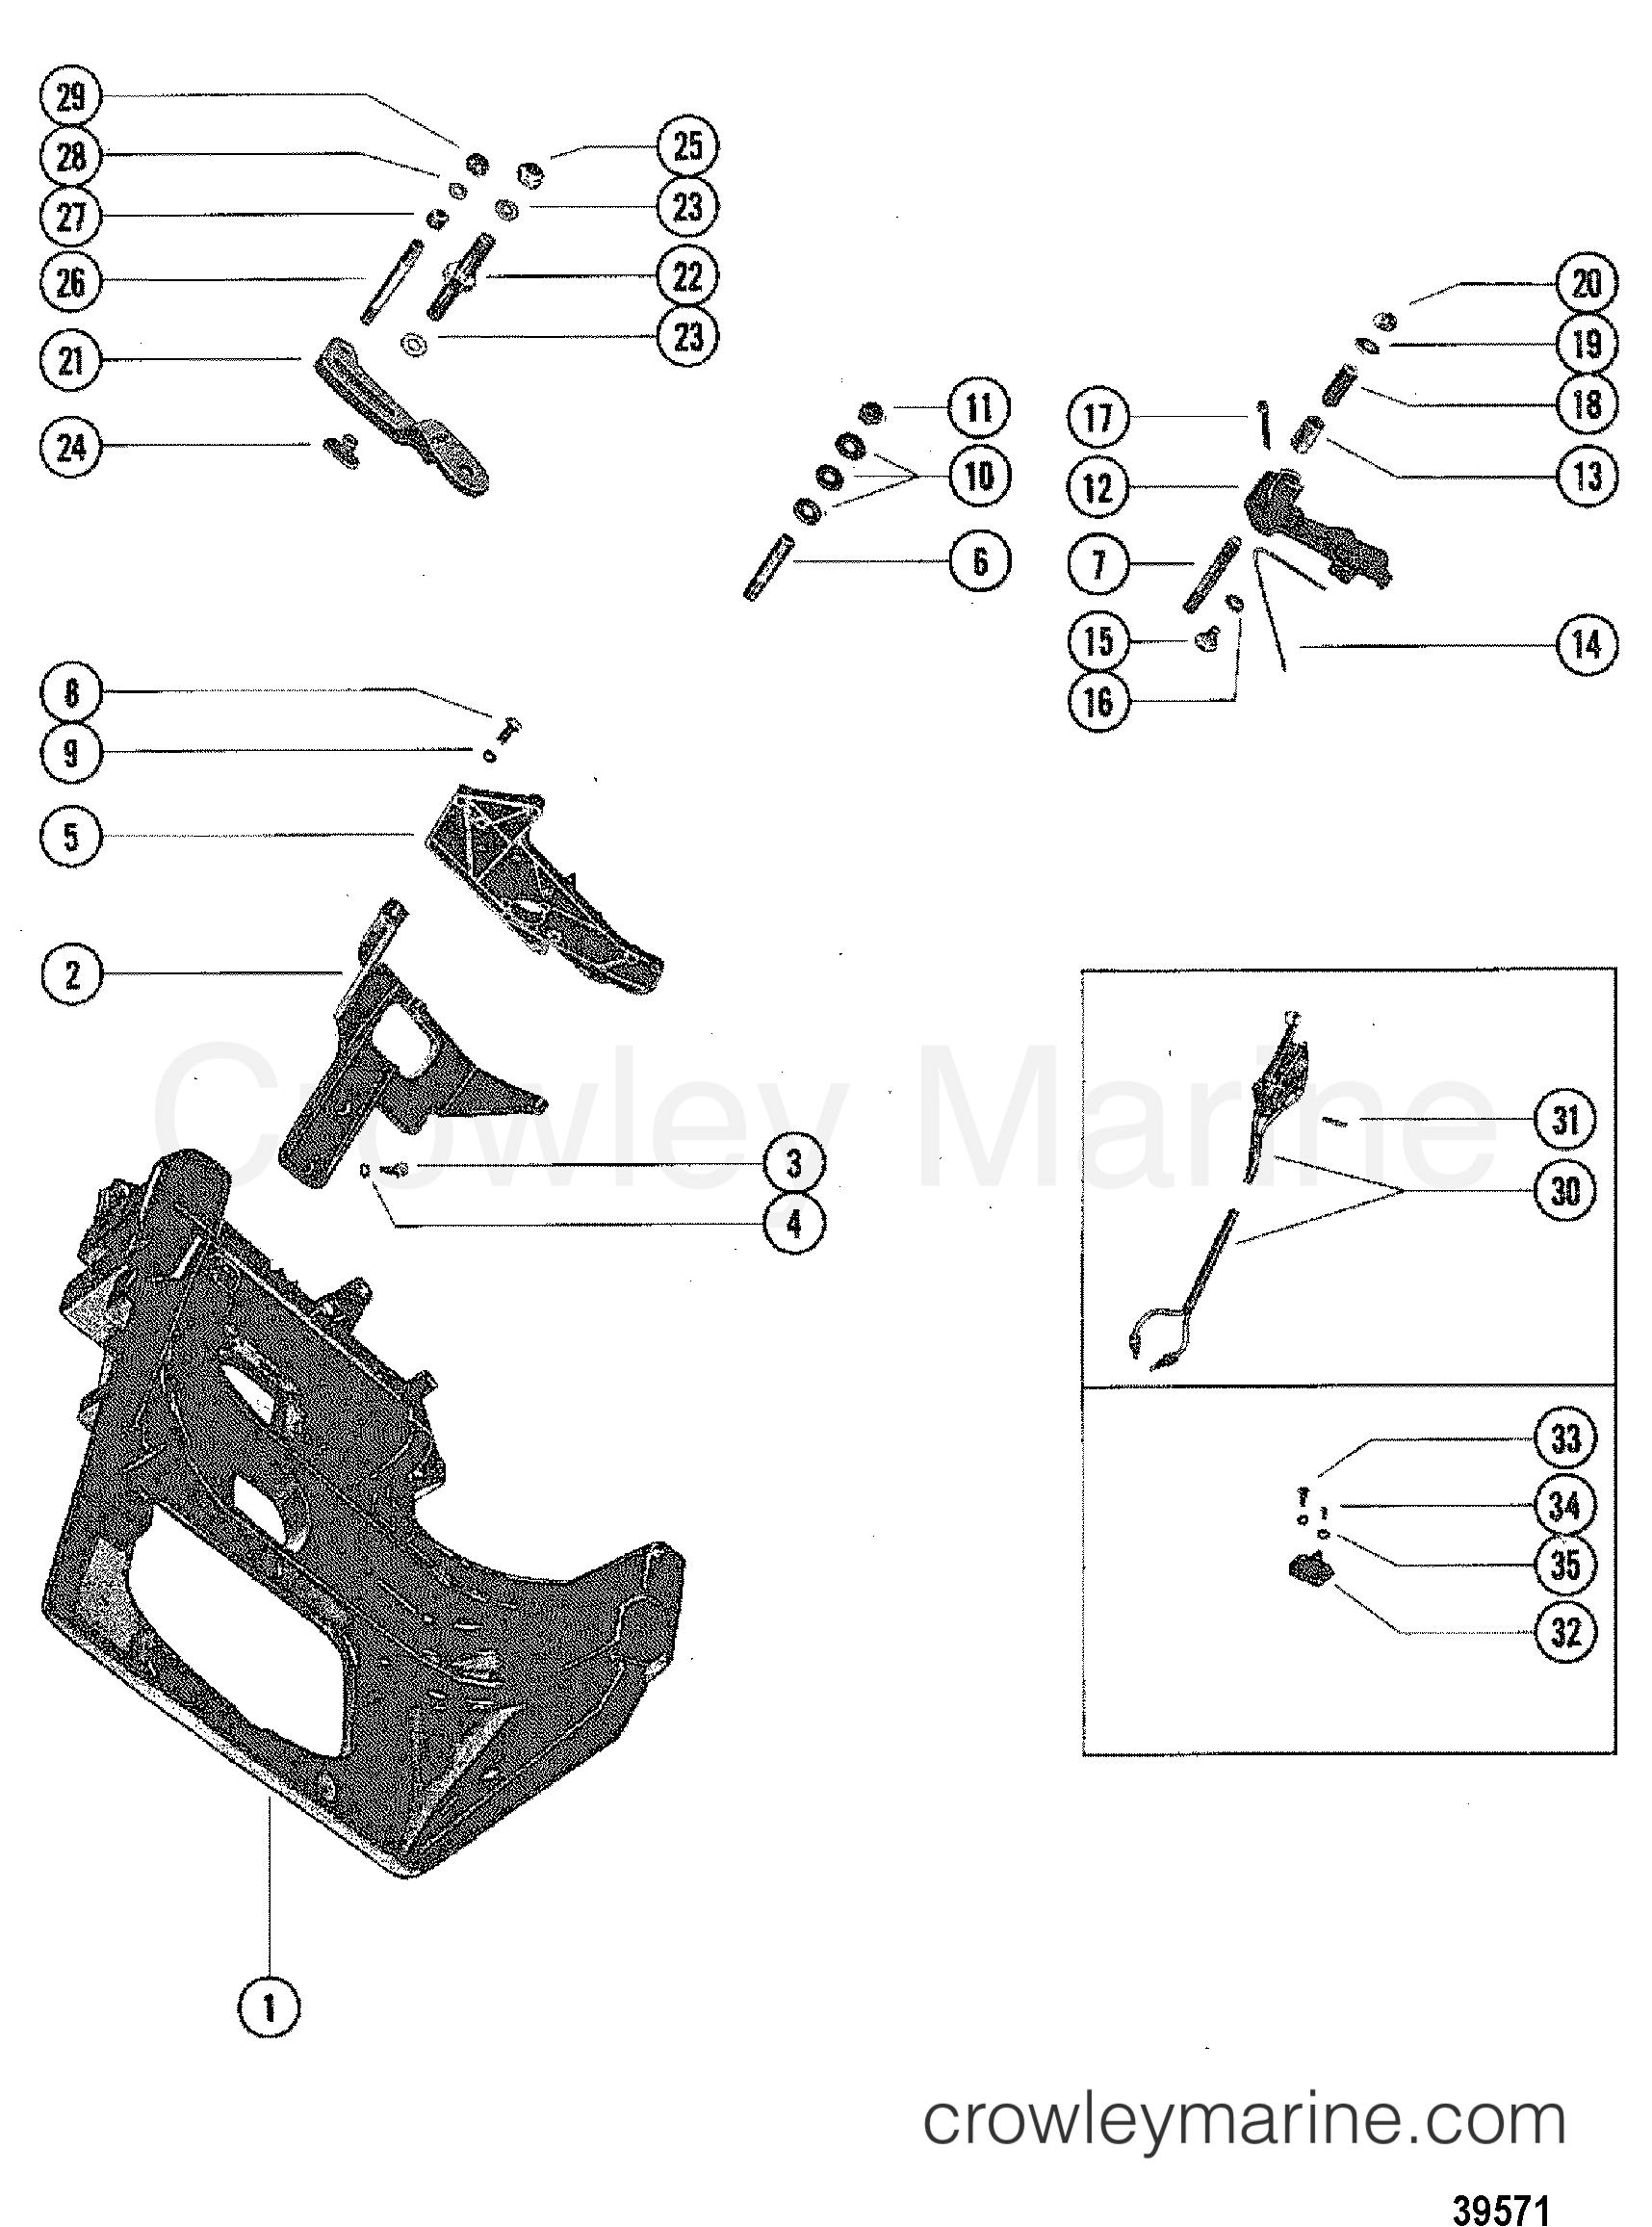 transom plate and shift lever in line engines 1981. Black Bedroom Furniture Sets. Home Design Ideas